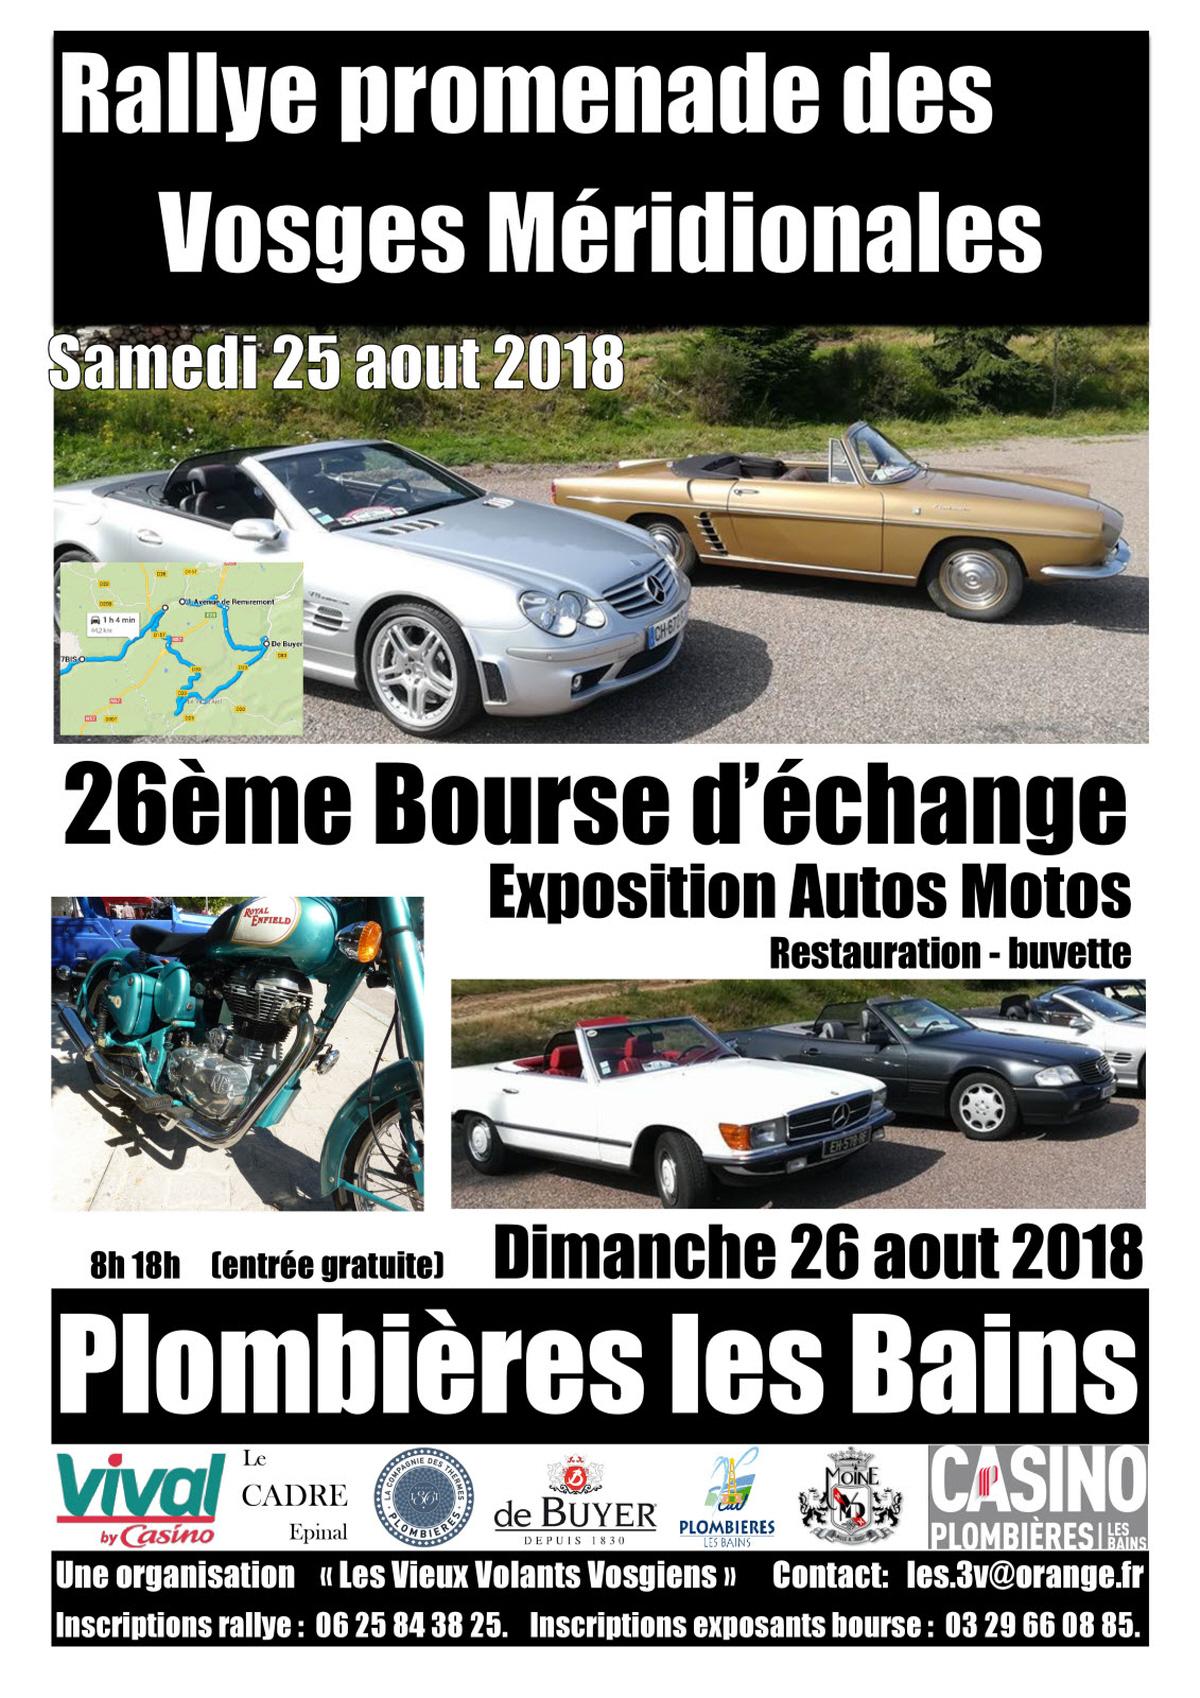 Rallye promenade des Vosges Méridionales